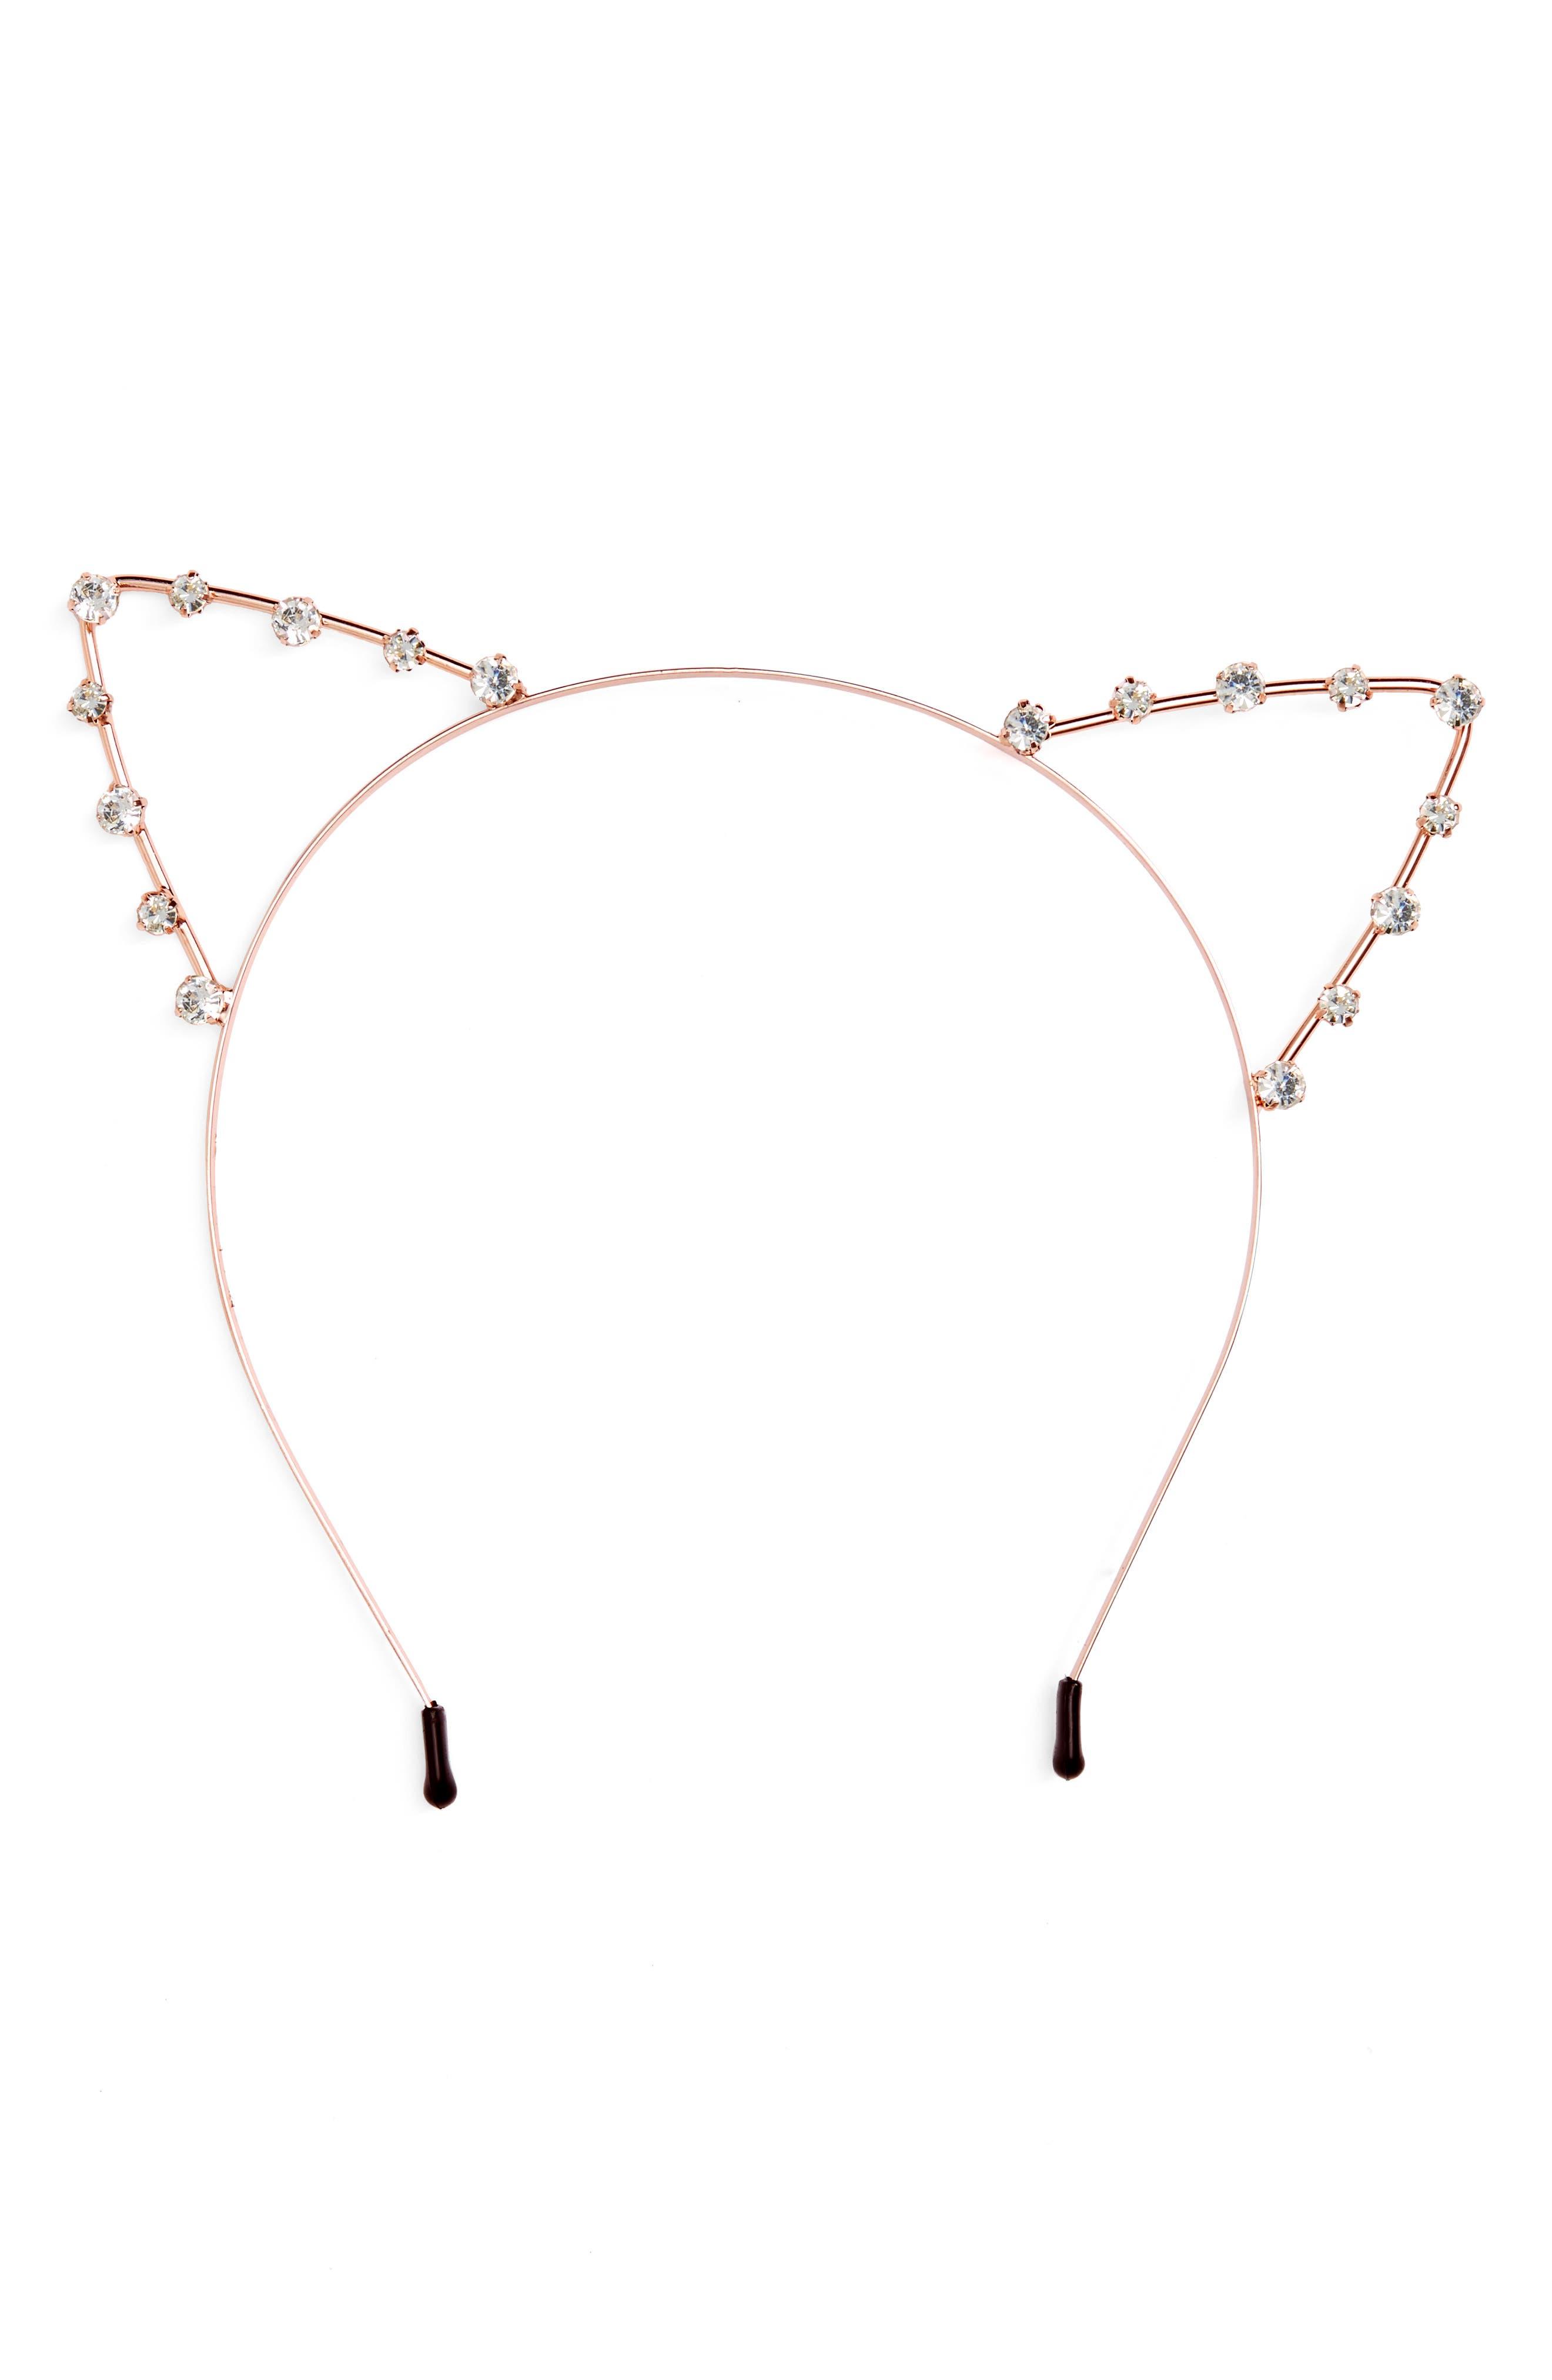 Crystal Cat Ears Headband,                         Main,                         color, 711